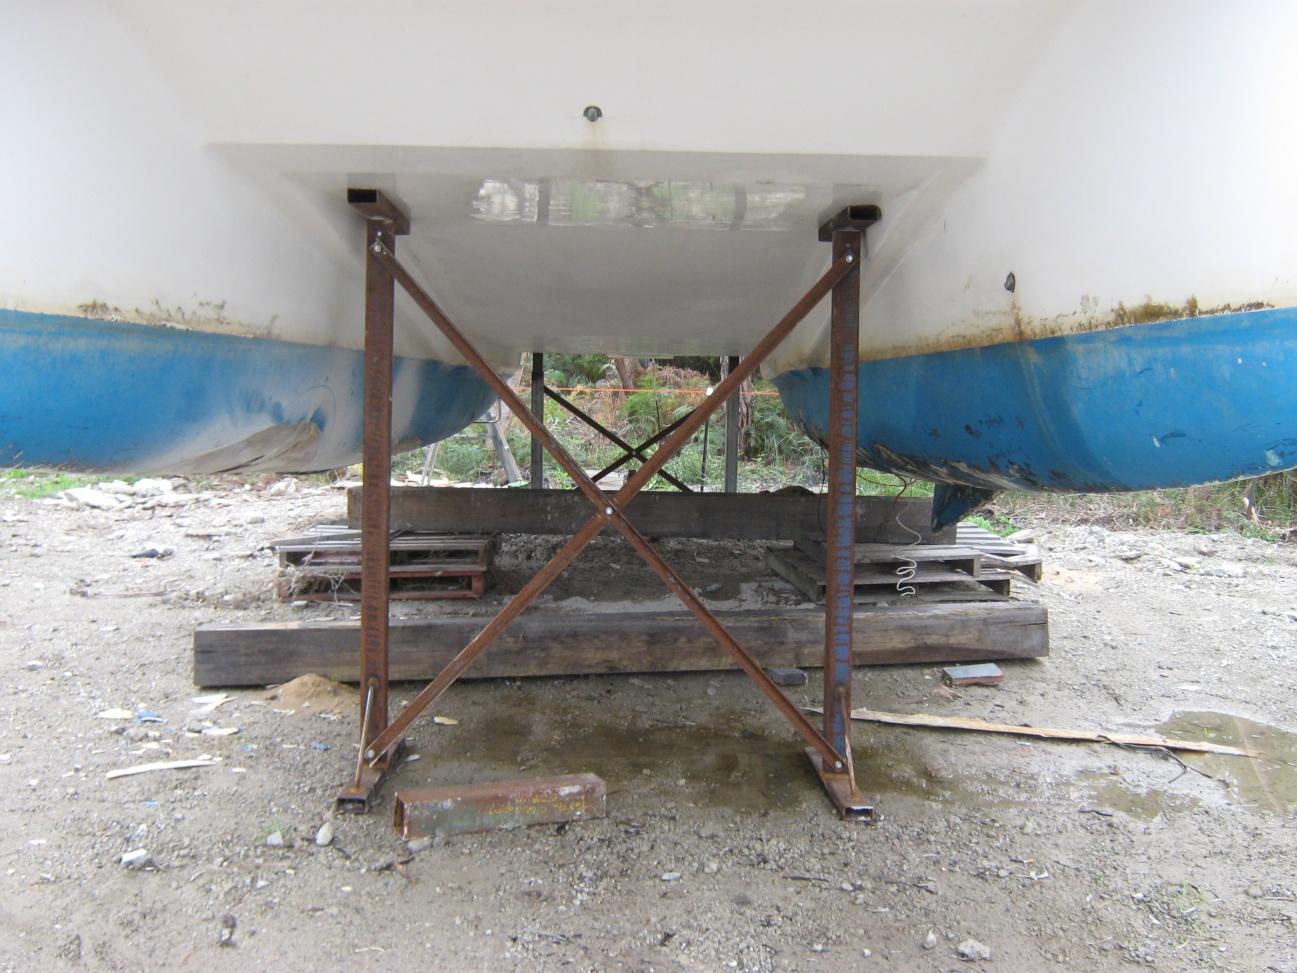 Click image for larger version  Name:Boat repairs in progress at Yaringa. June 2012 005.jpg Views:161 Size:428.0 KB ID:42443